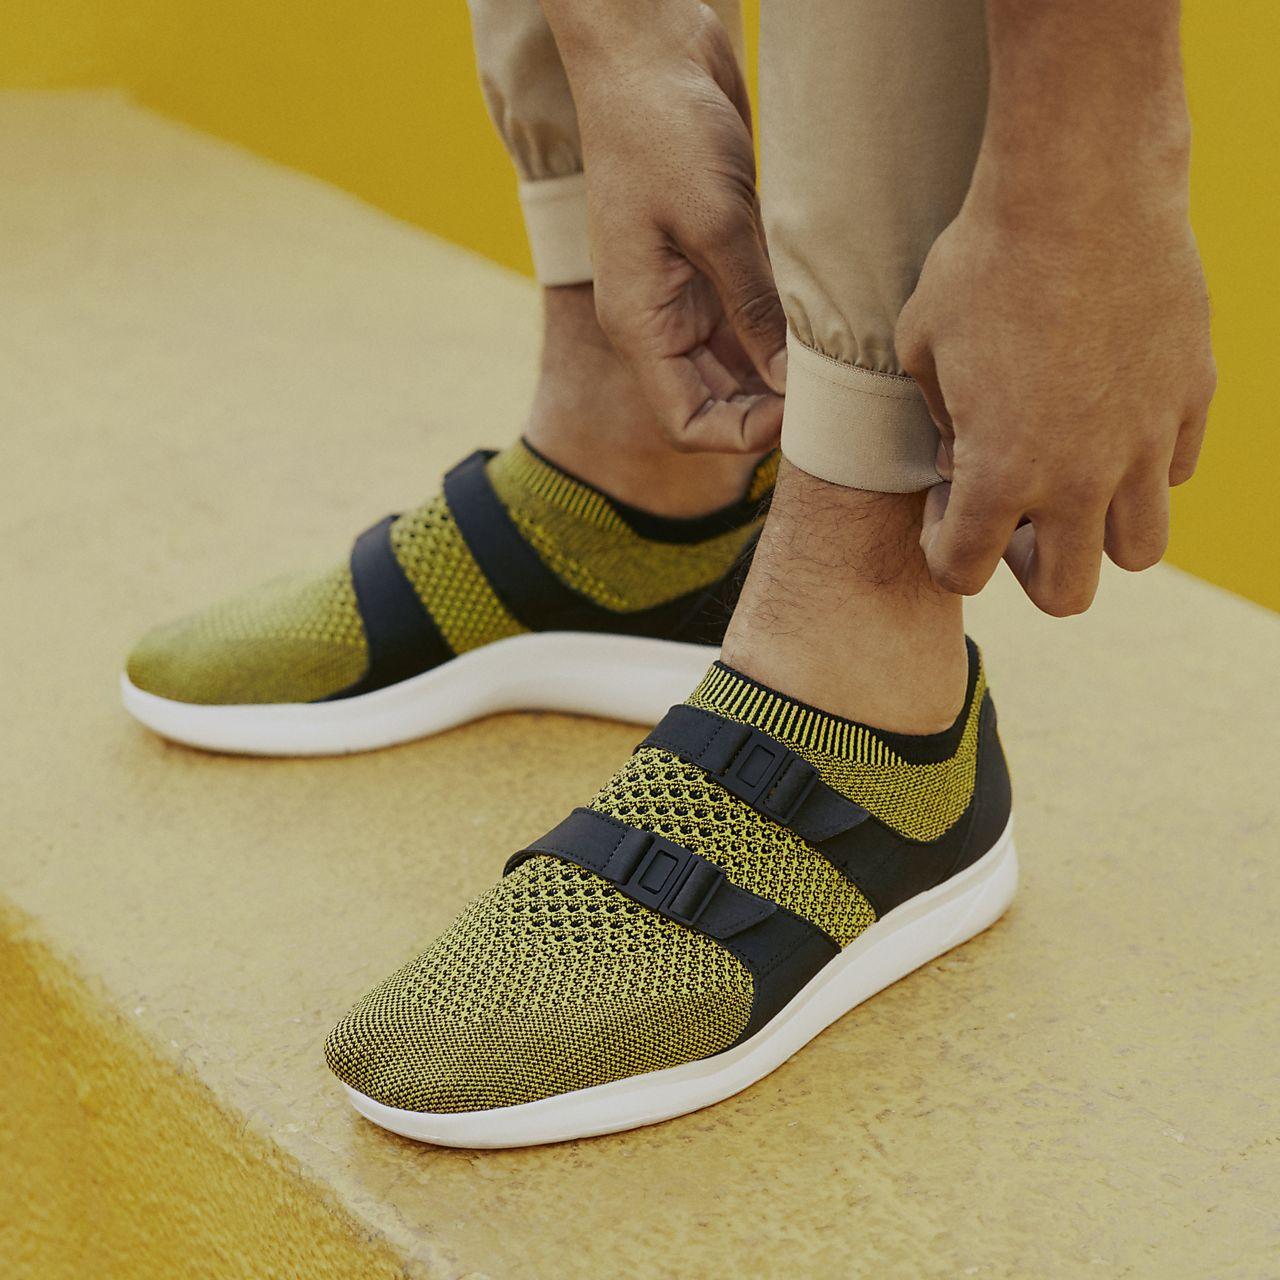 best loved 01dc7 c1702 ... 898022-700,Yellow StrikeBlack ... Nike Air Sock Racer Ultra Flyknit Mens  Shoe .